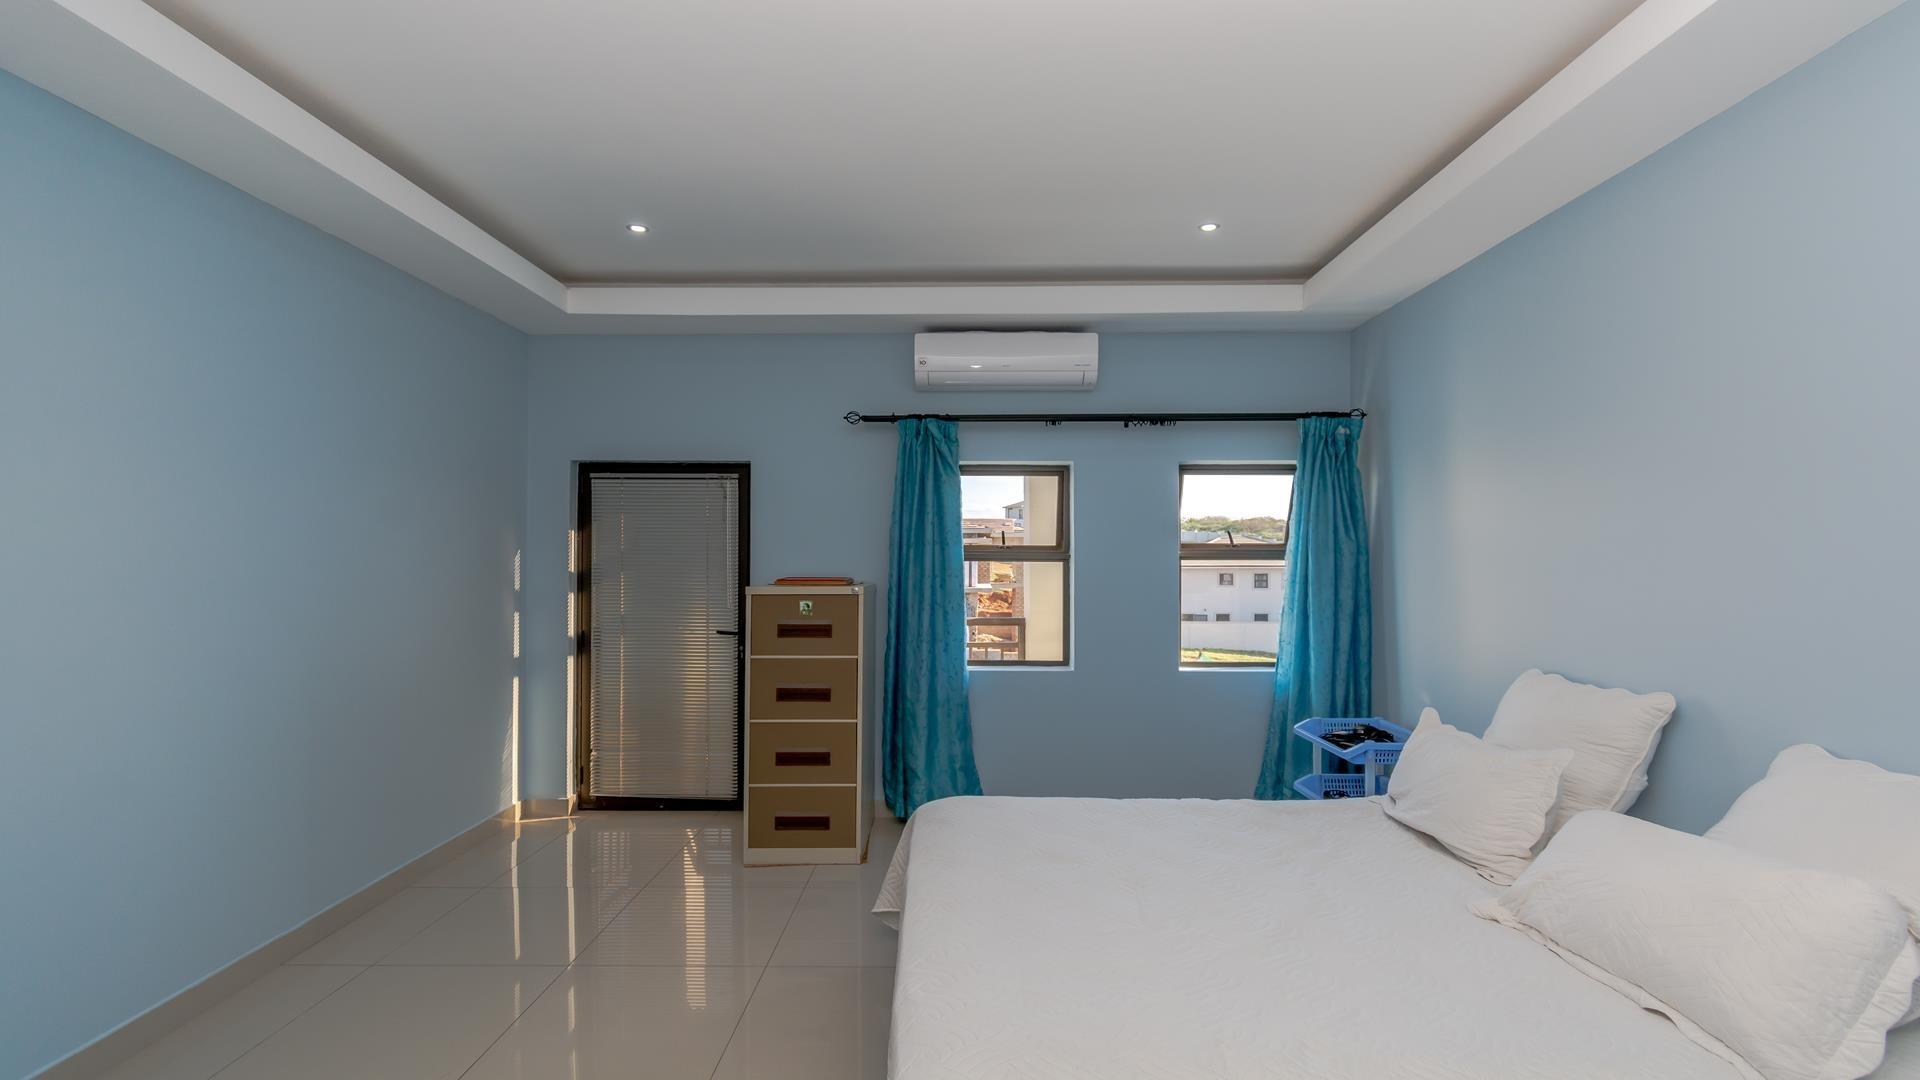 4 Bedroom House For Sale in Desainagar